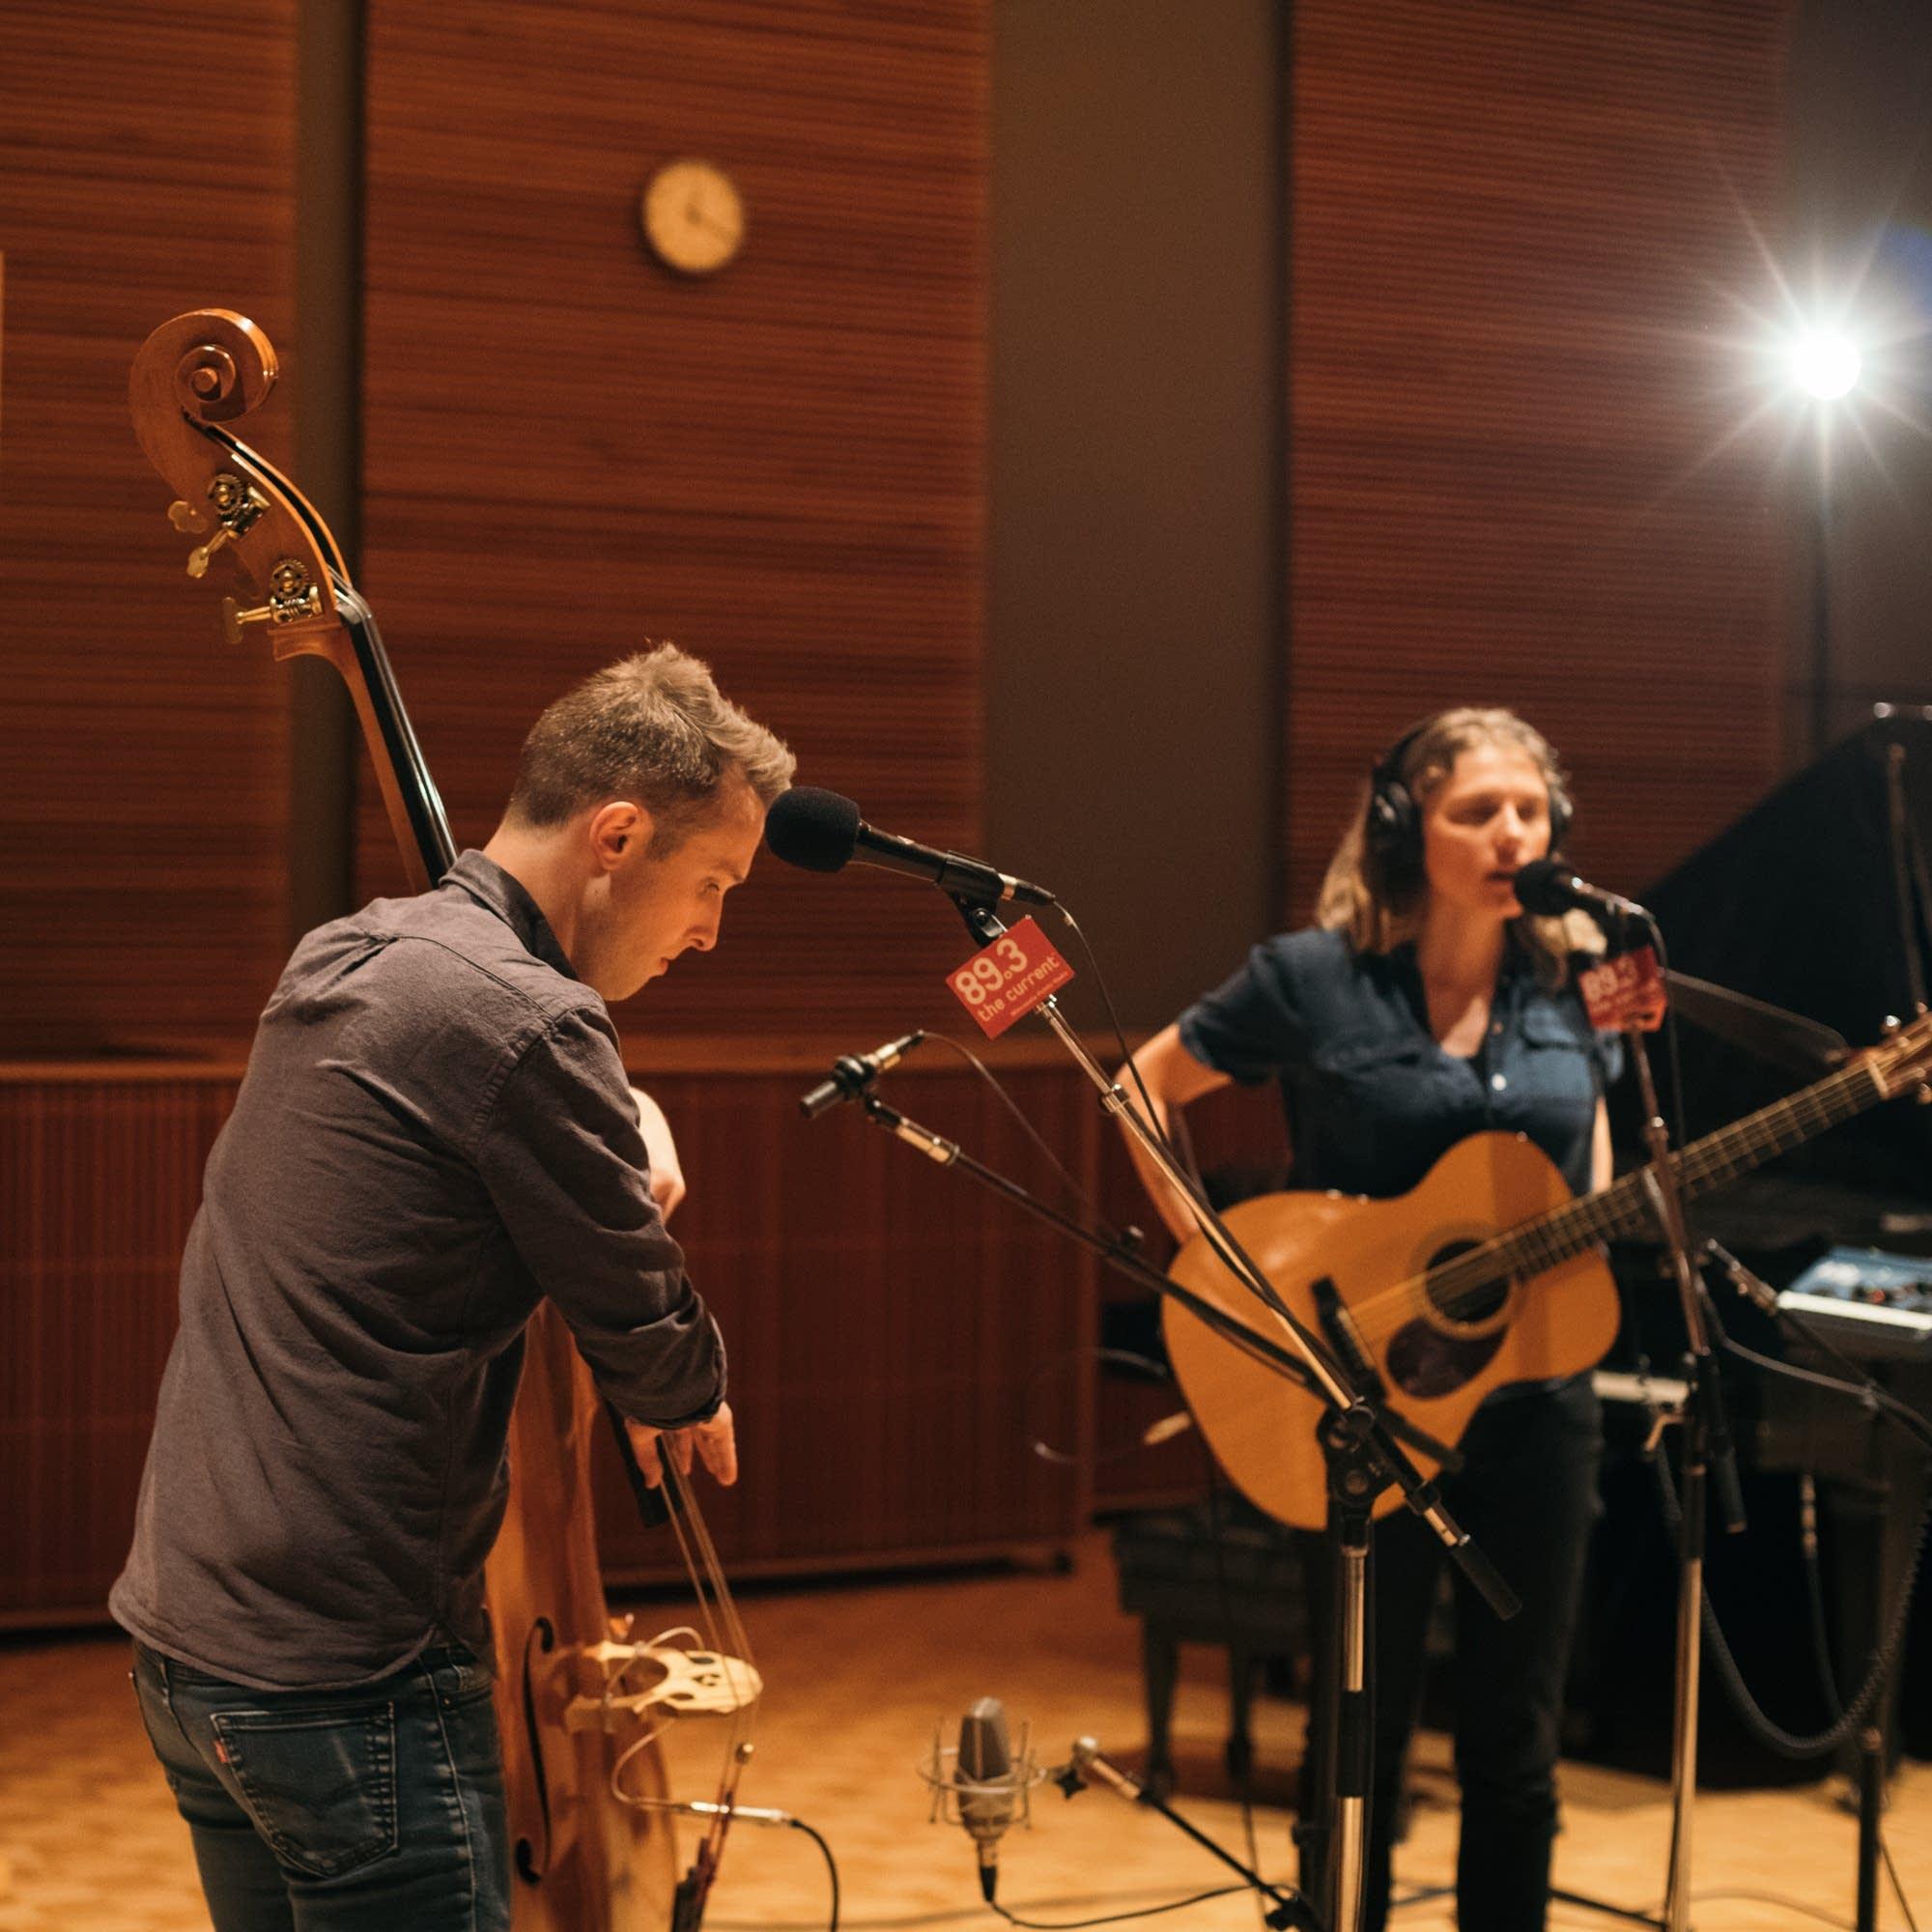 Dead Horses perform in the Radio Heartland studio